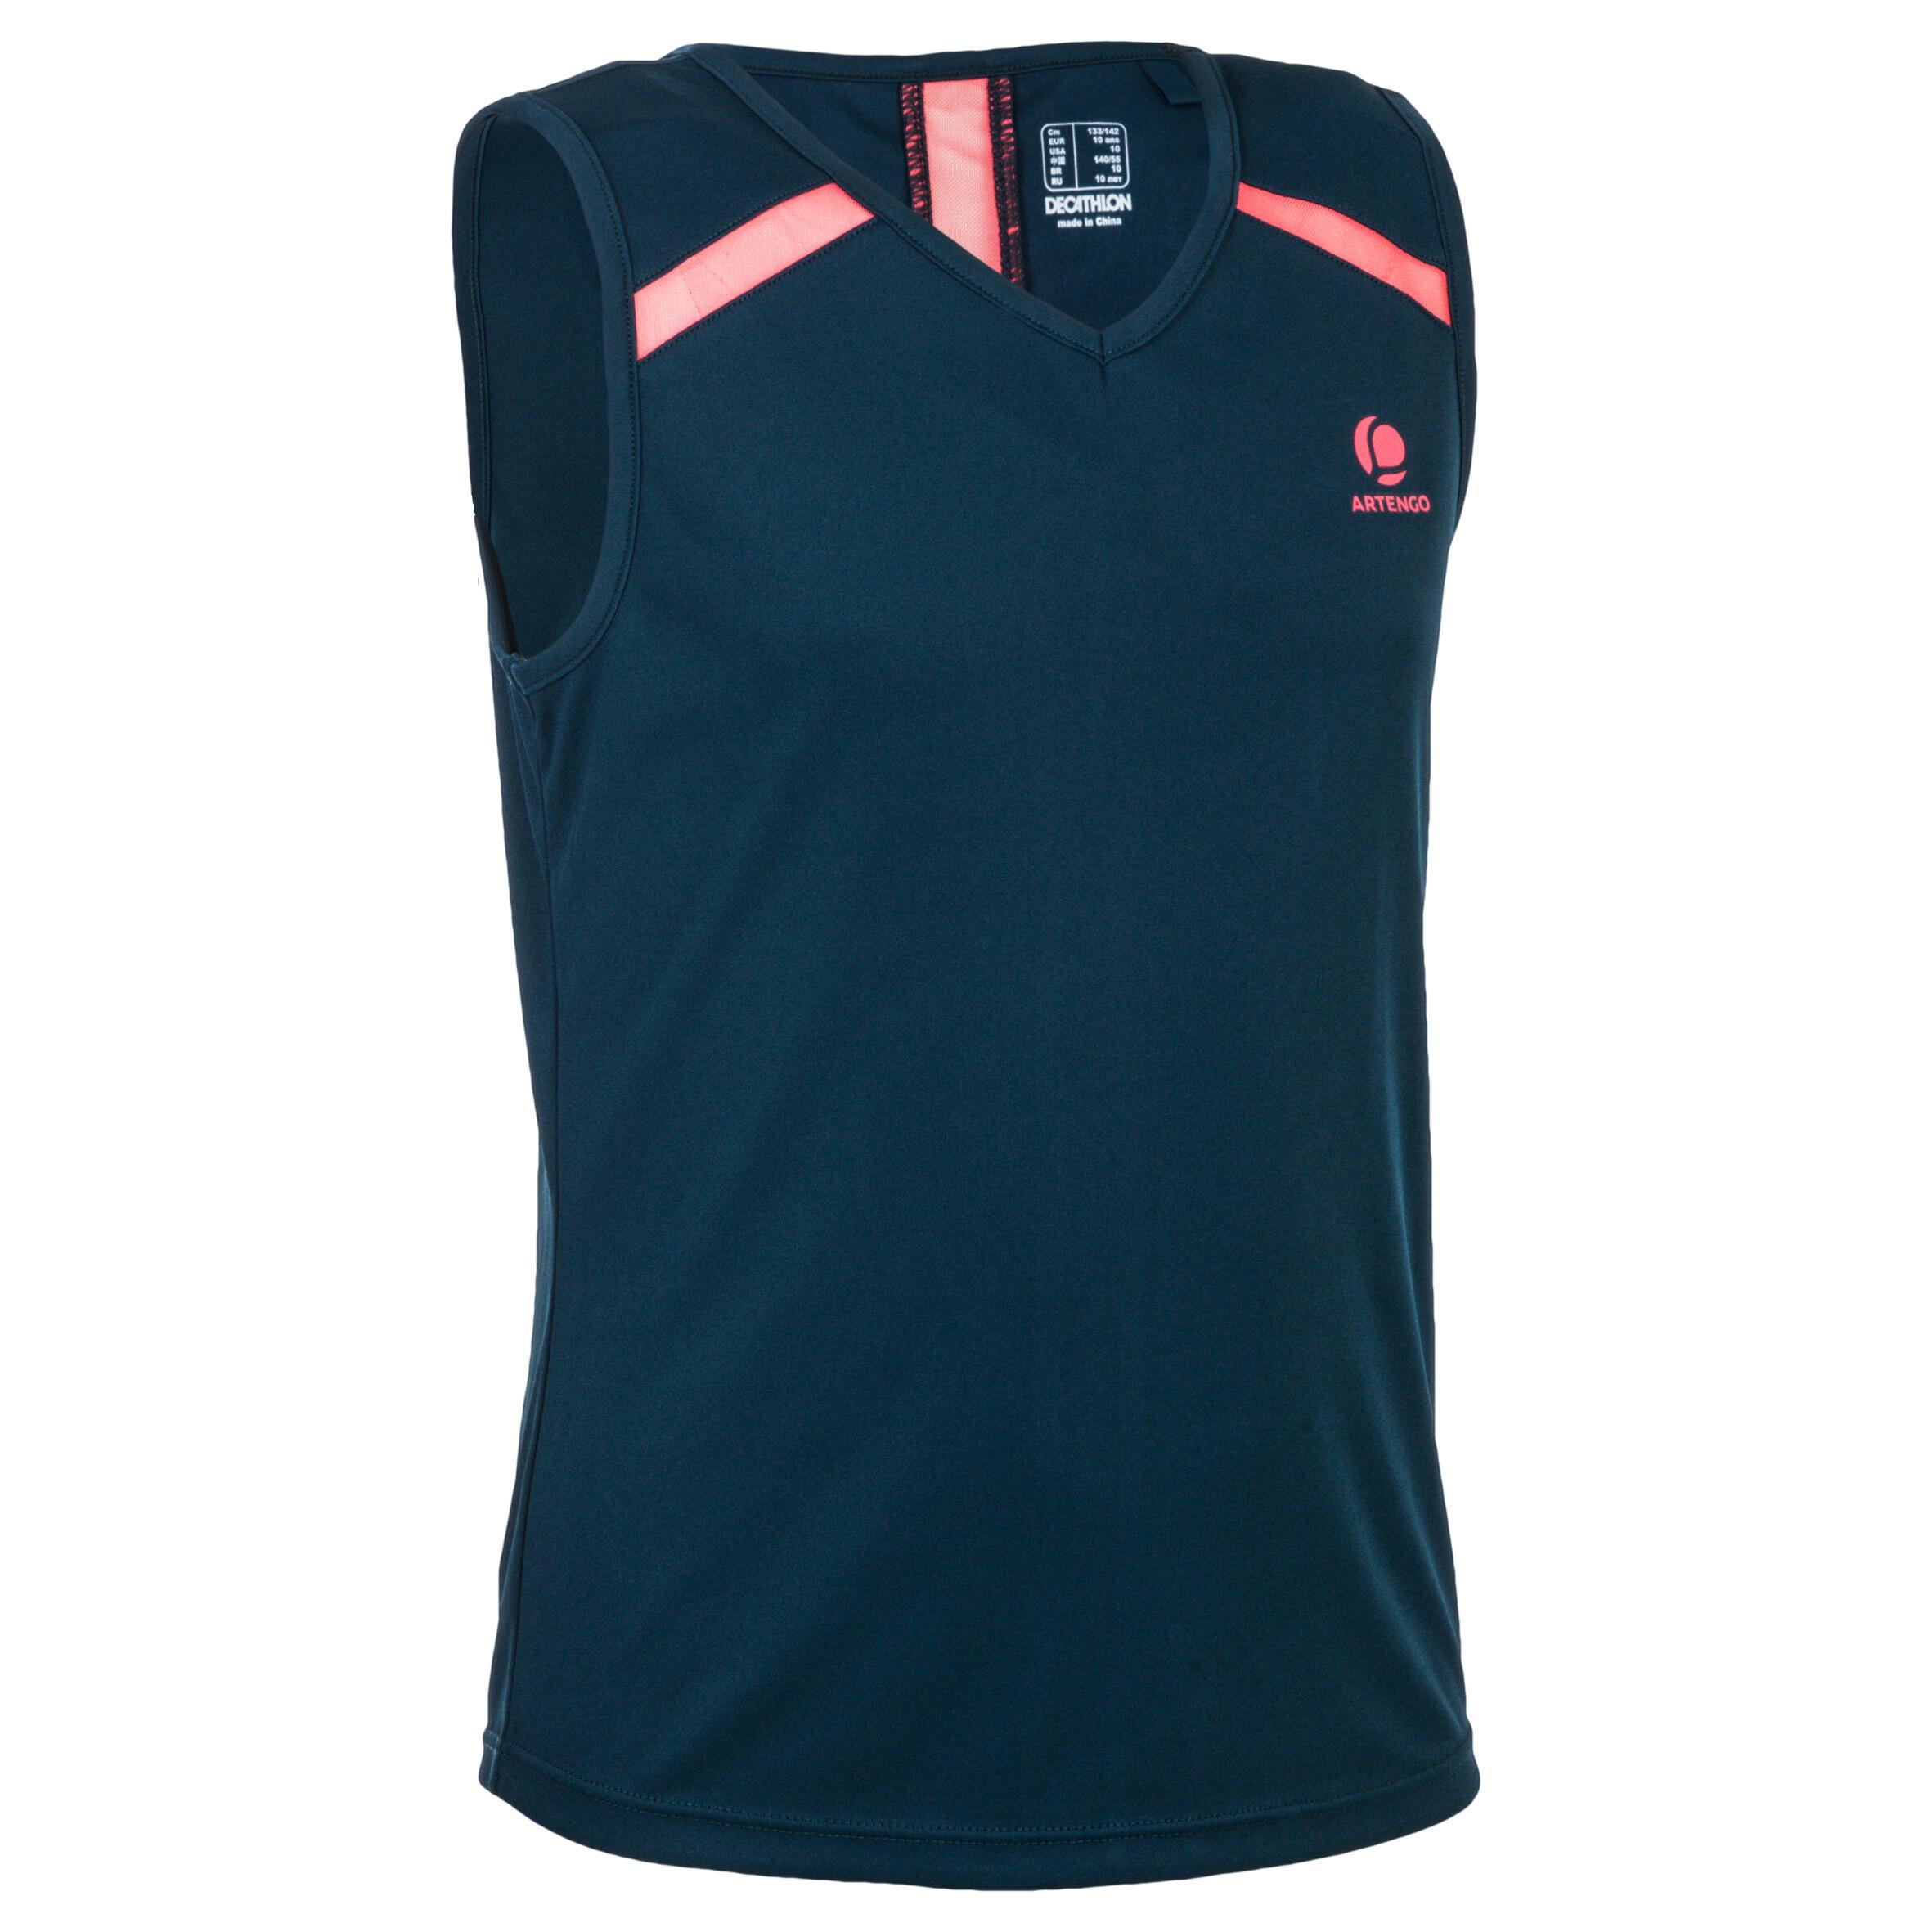 Artengo T-shirt 900 meisjes petroleumblauw